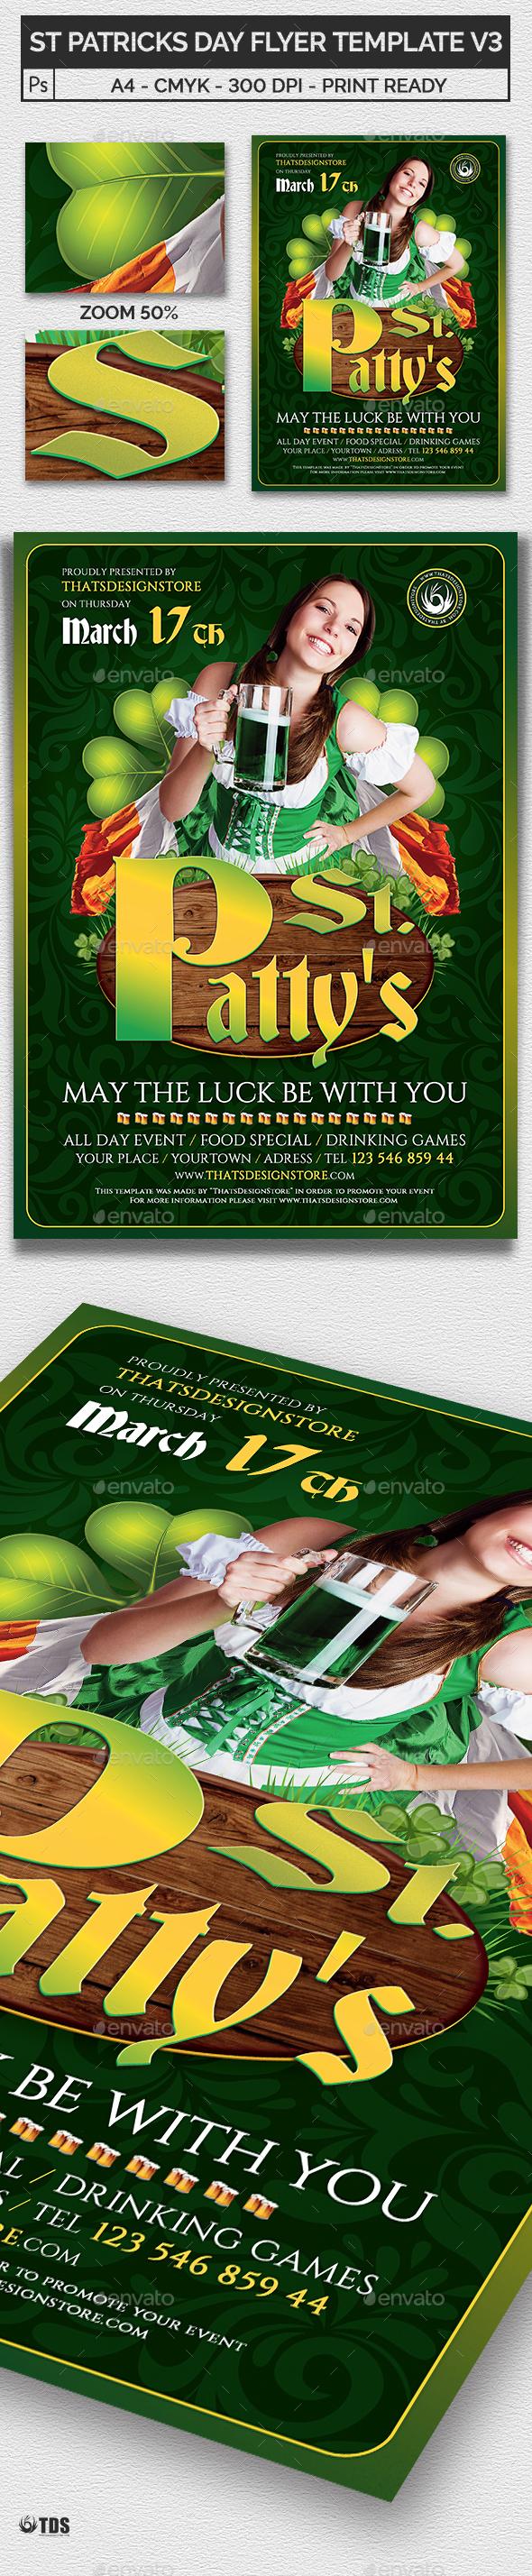 Saint Patricks Day Flyer Template V3 - Holidays Events